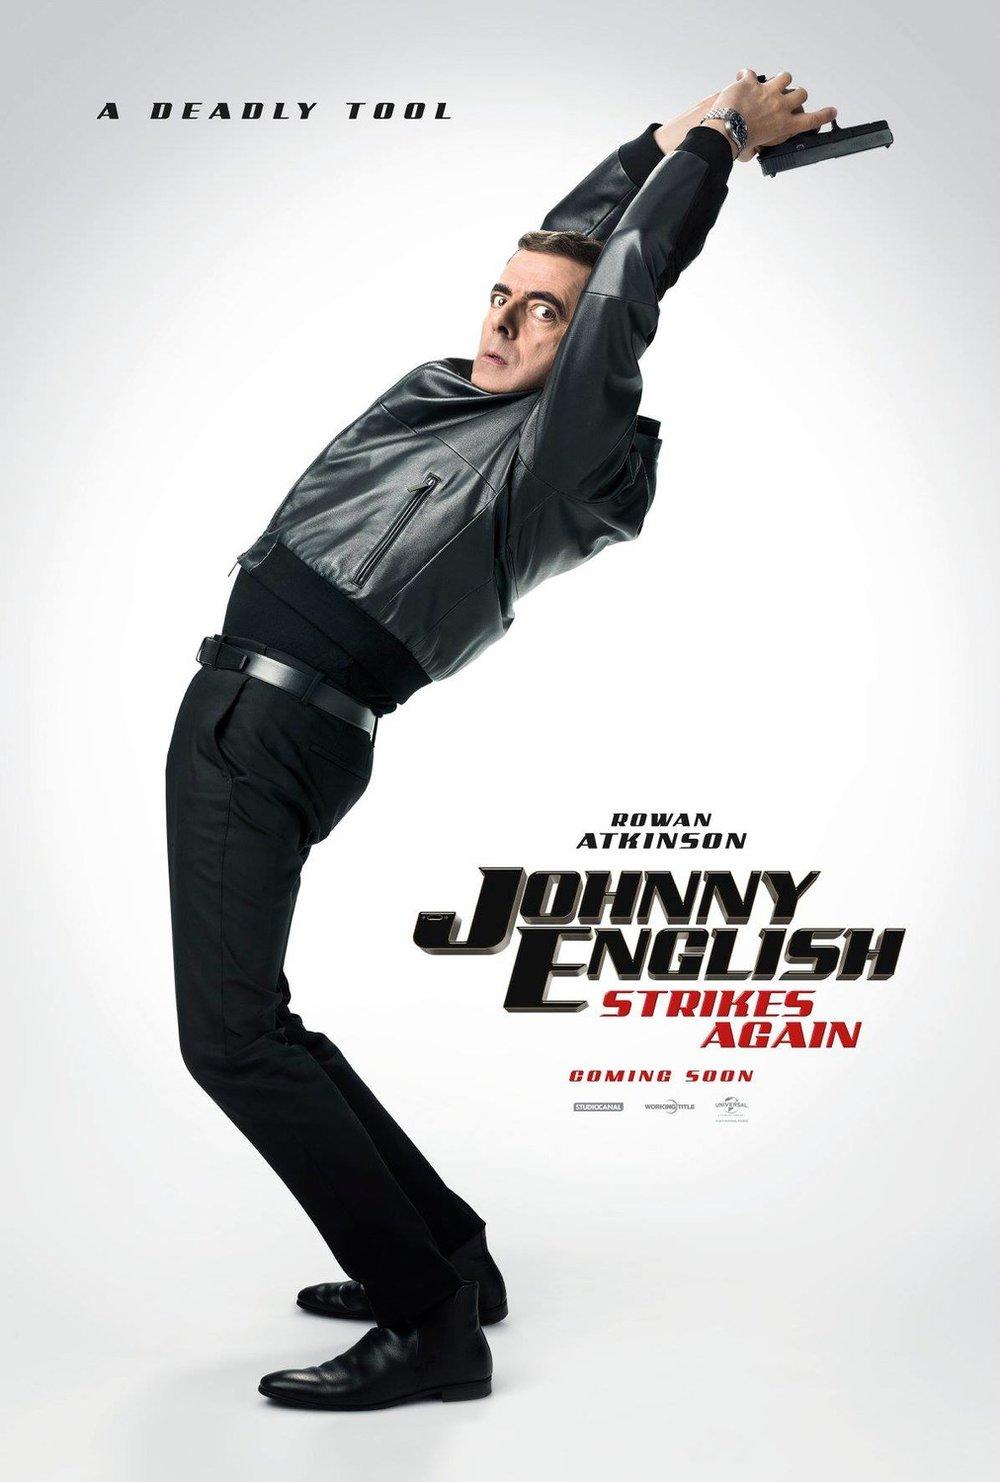 Johnny English - Coming soon to cinemas nationwide…